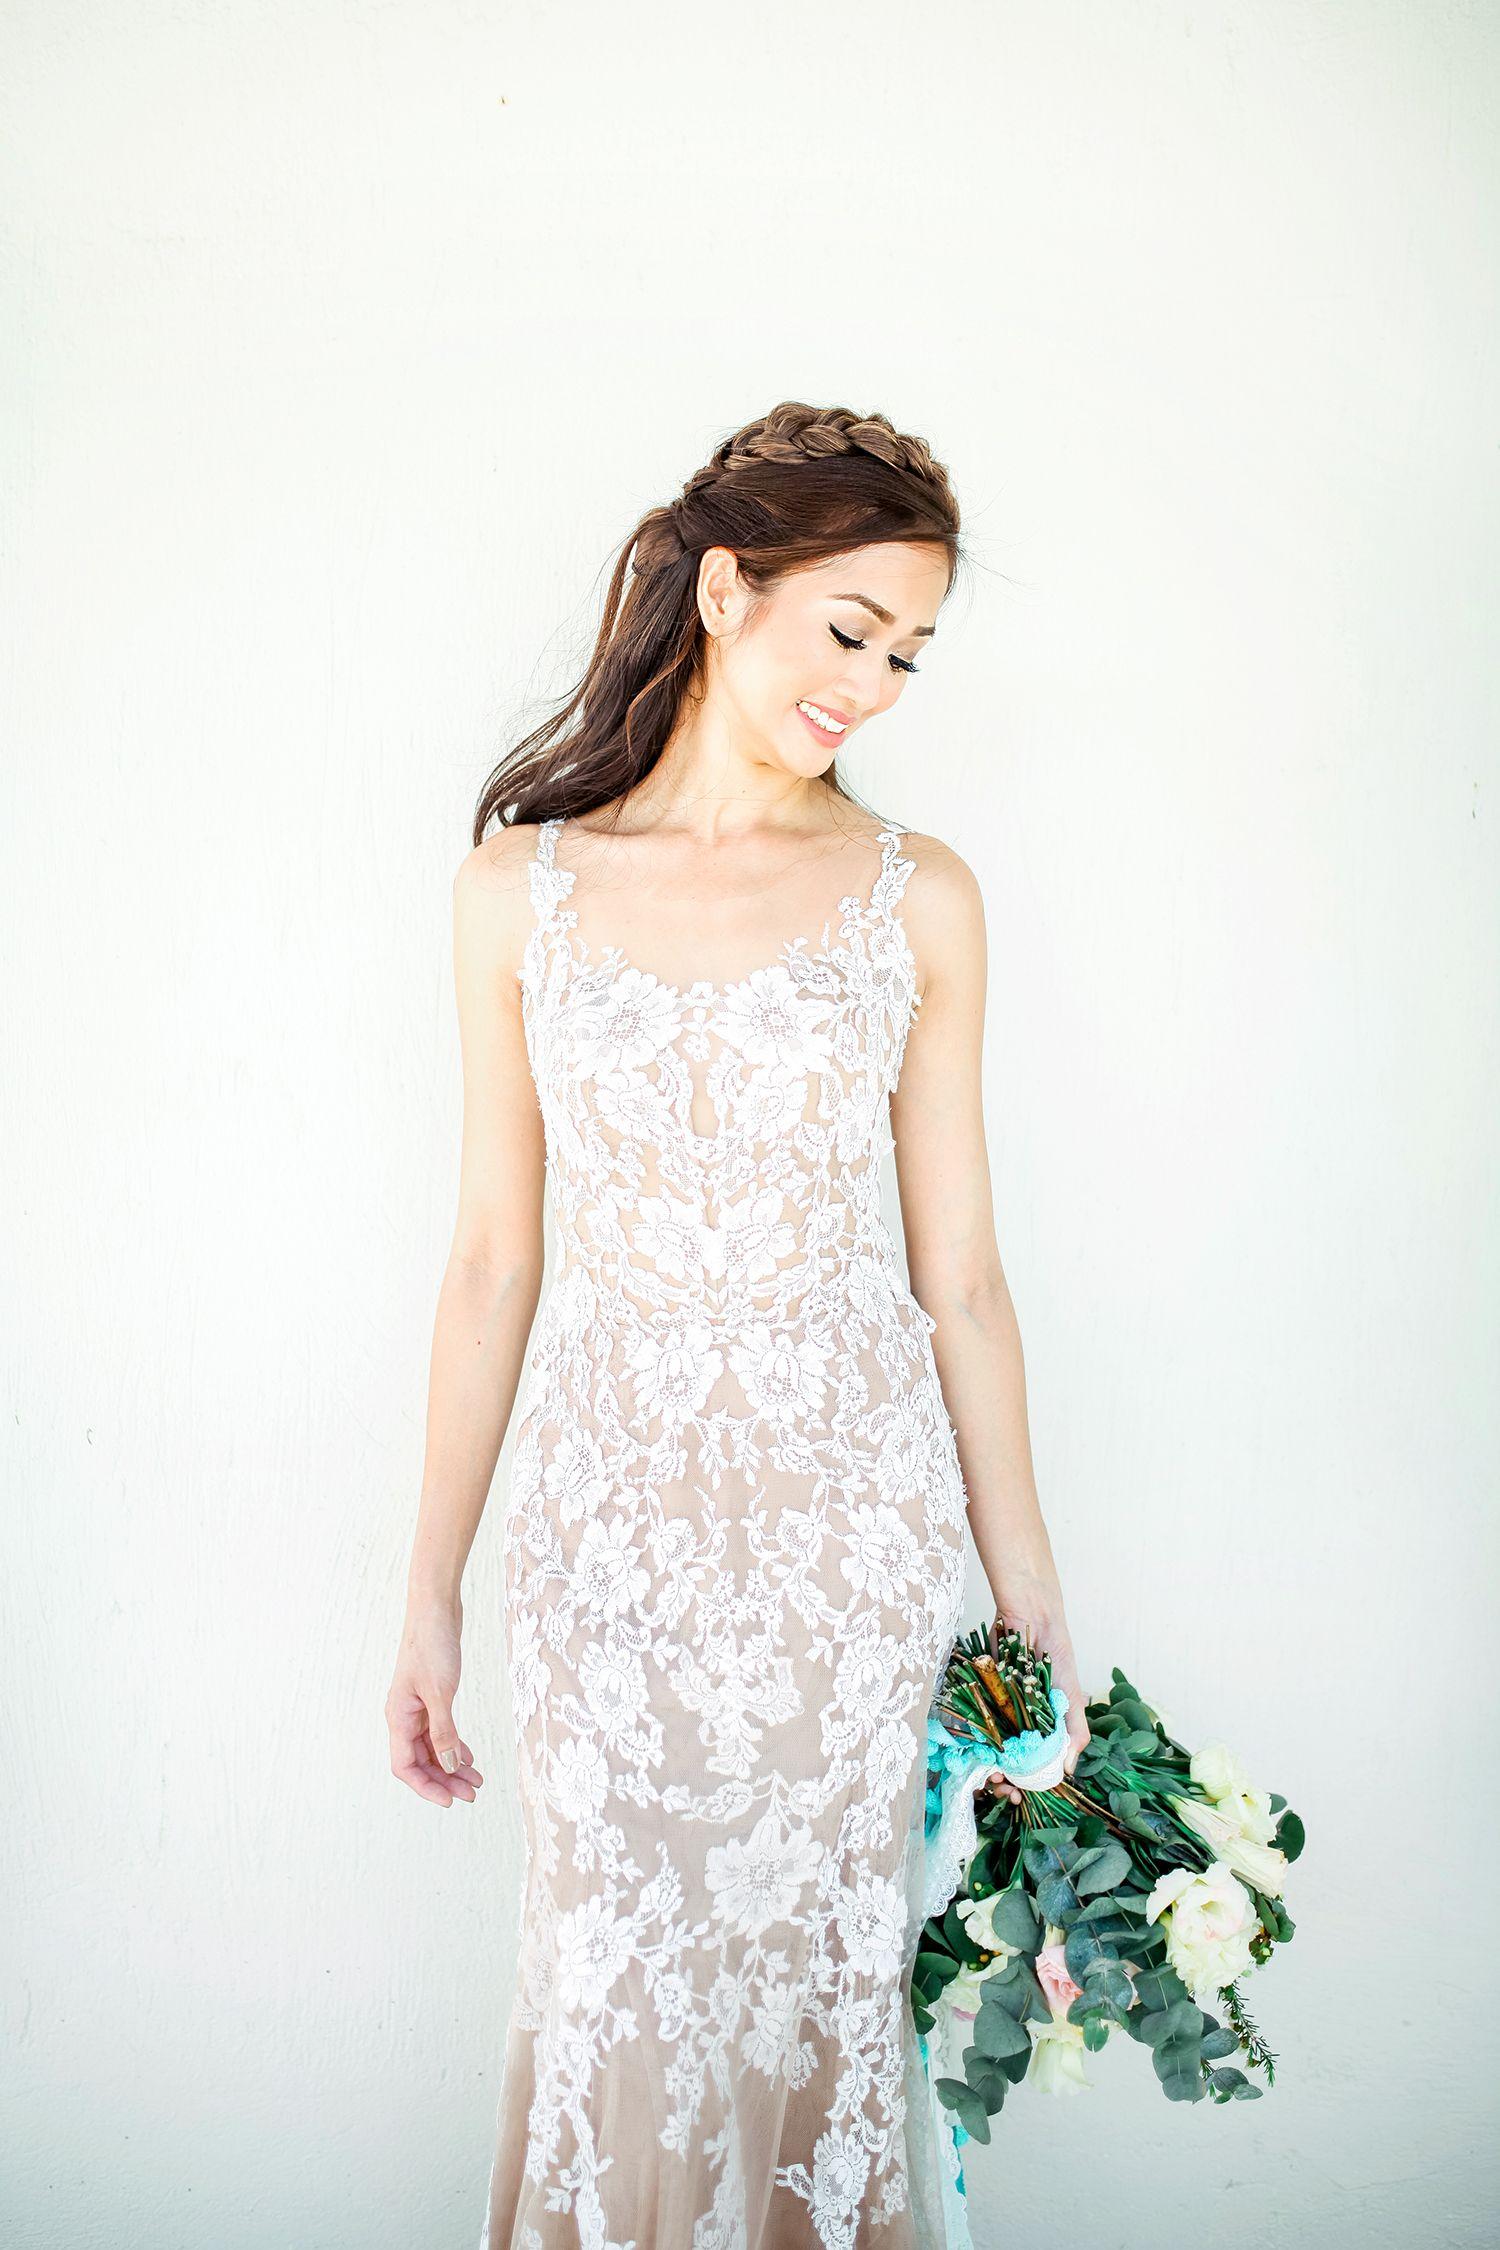 Amazing Beach Wedding In The Philippines Trendy Wedding Dresses Lace Beach Wedding Dress Wedding Dress Inspiration [ 2250 x 1500 Pixel ]